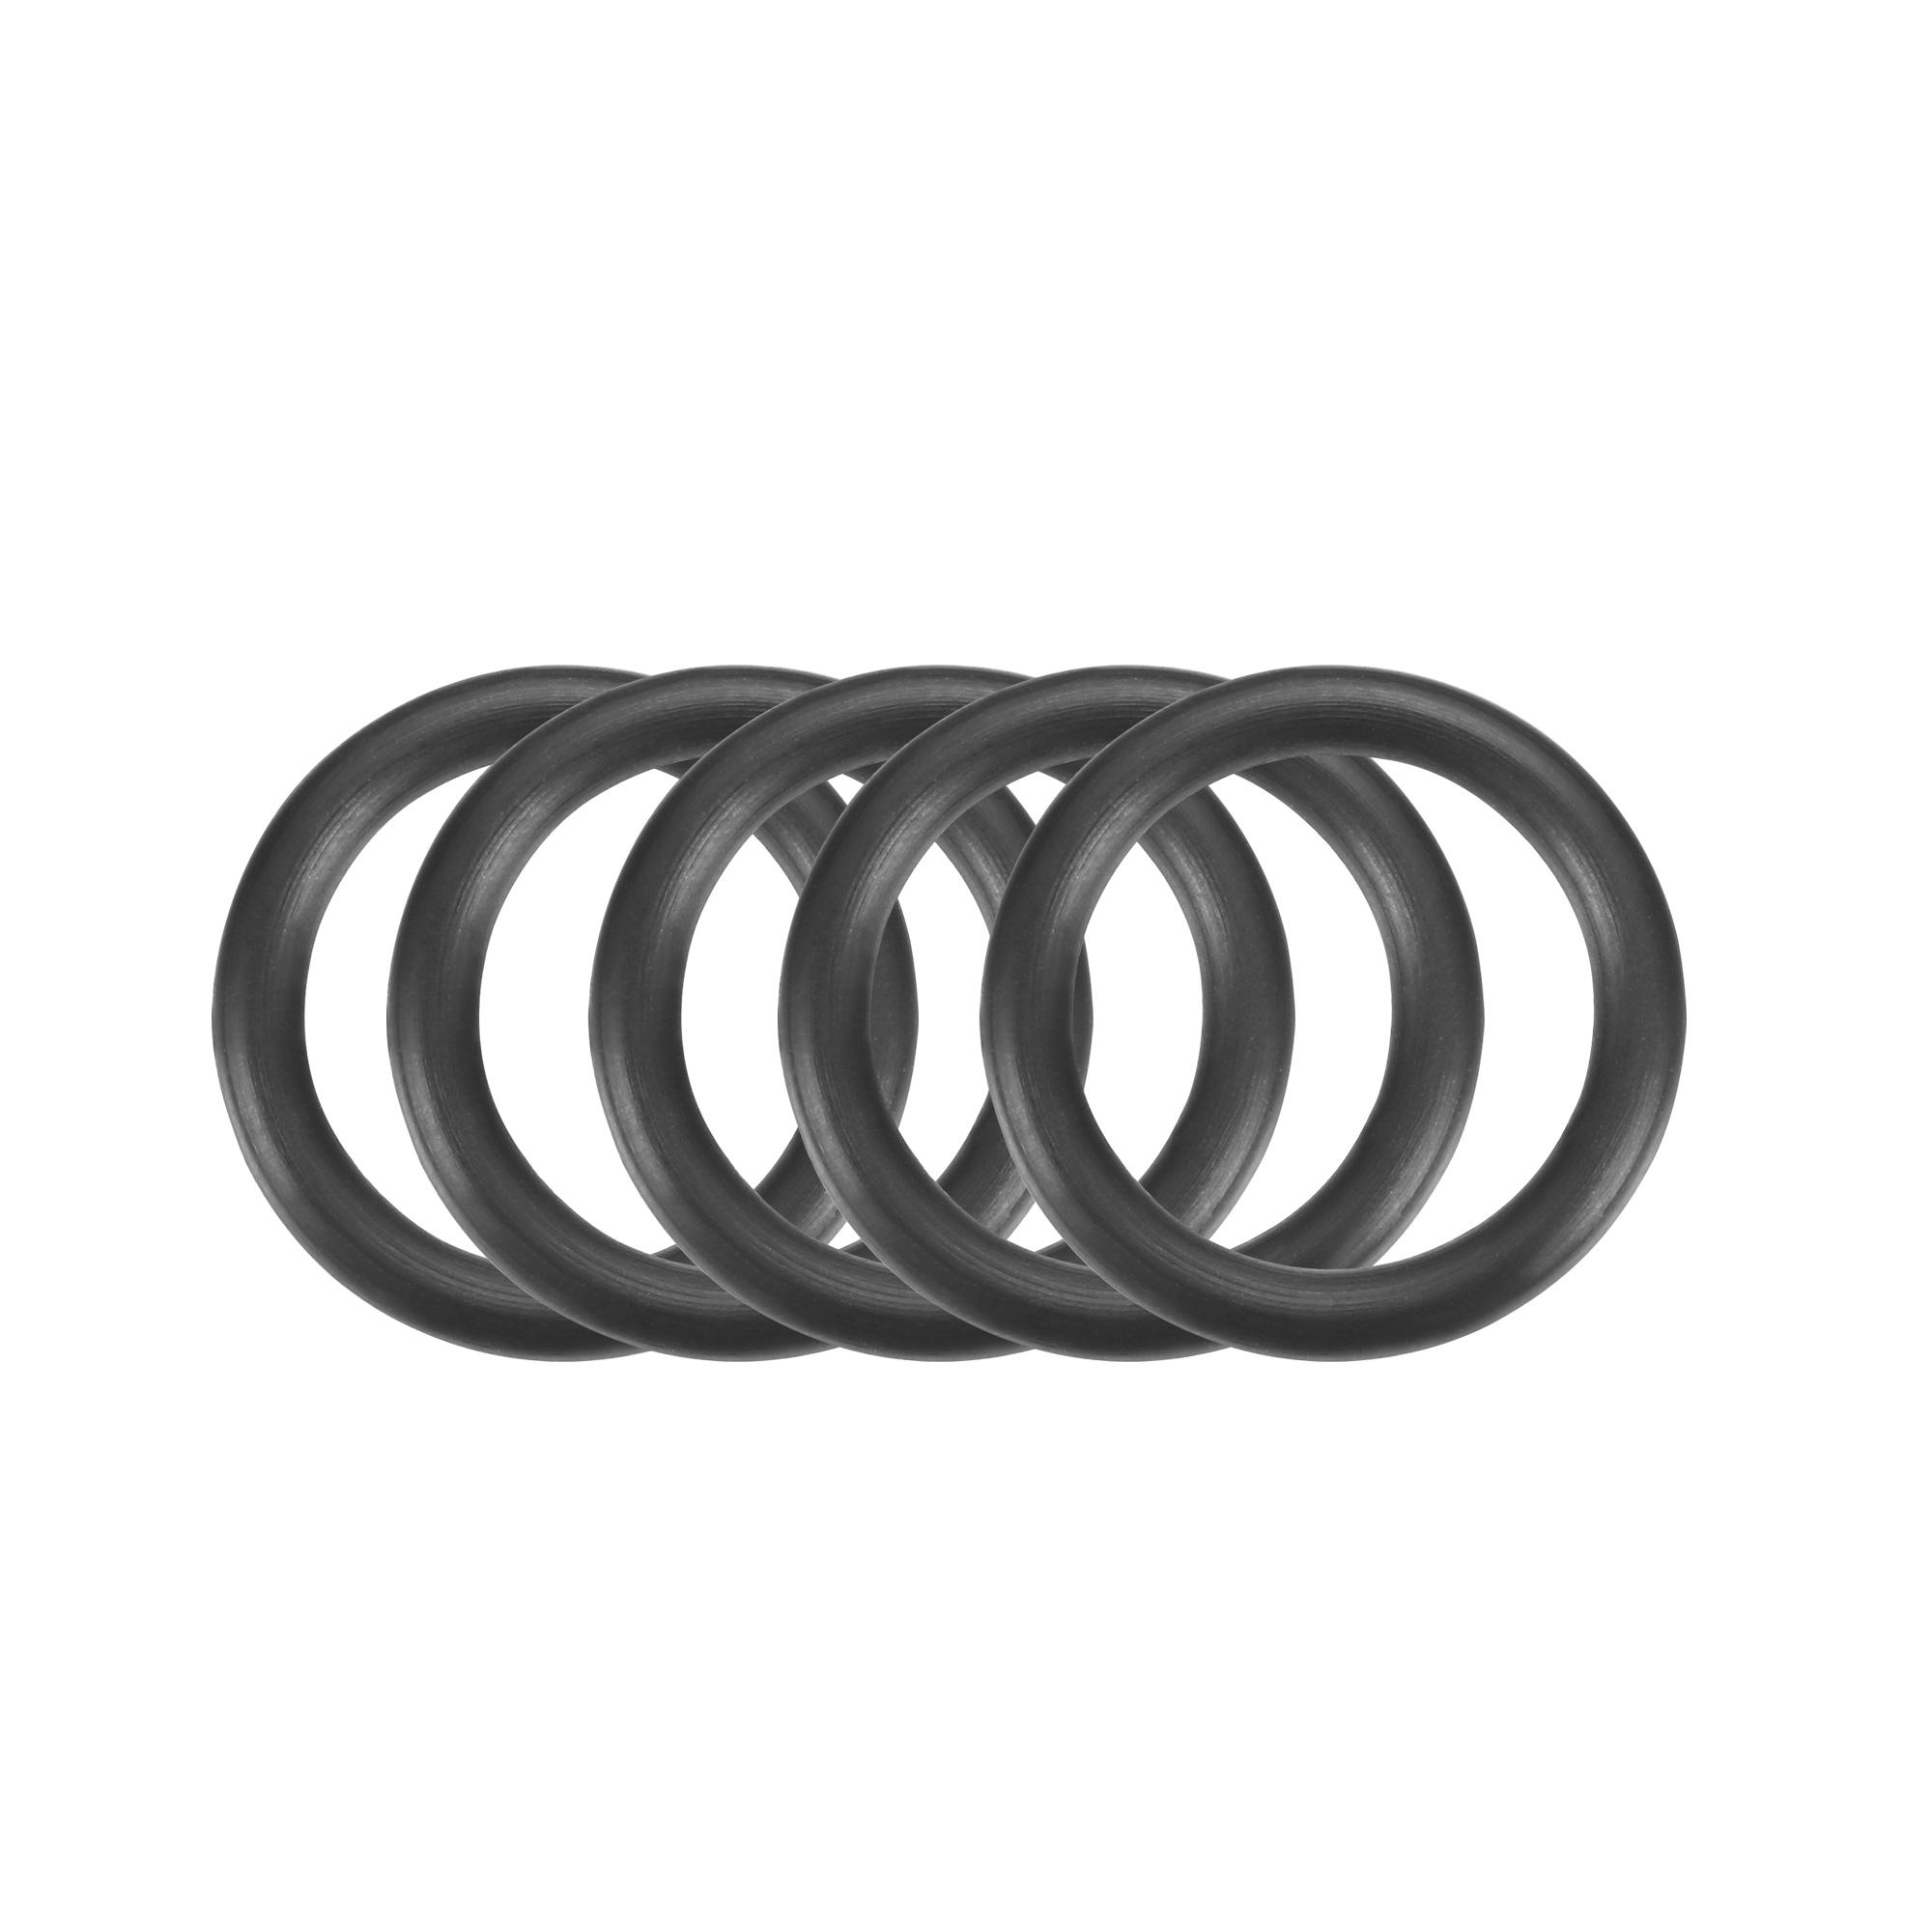 50 Pcs Black 15mm x 2mm Rubber Oil Resistant Sealing Ring O-shape Grommets